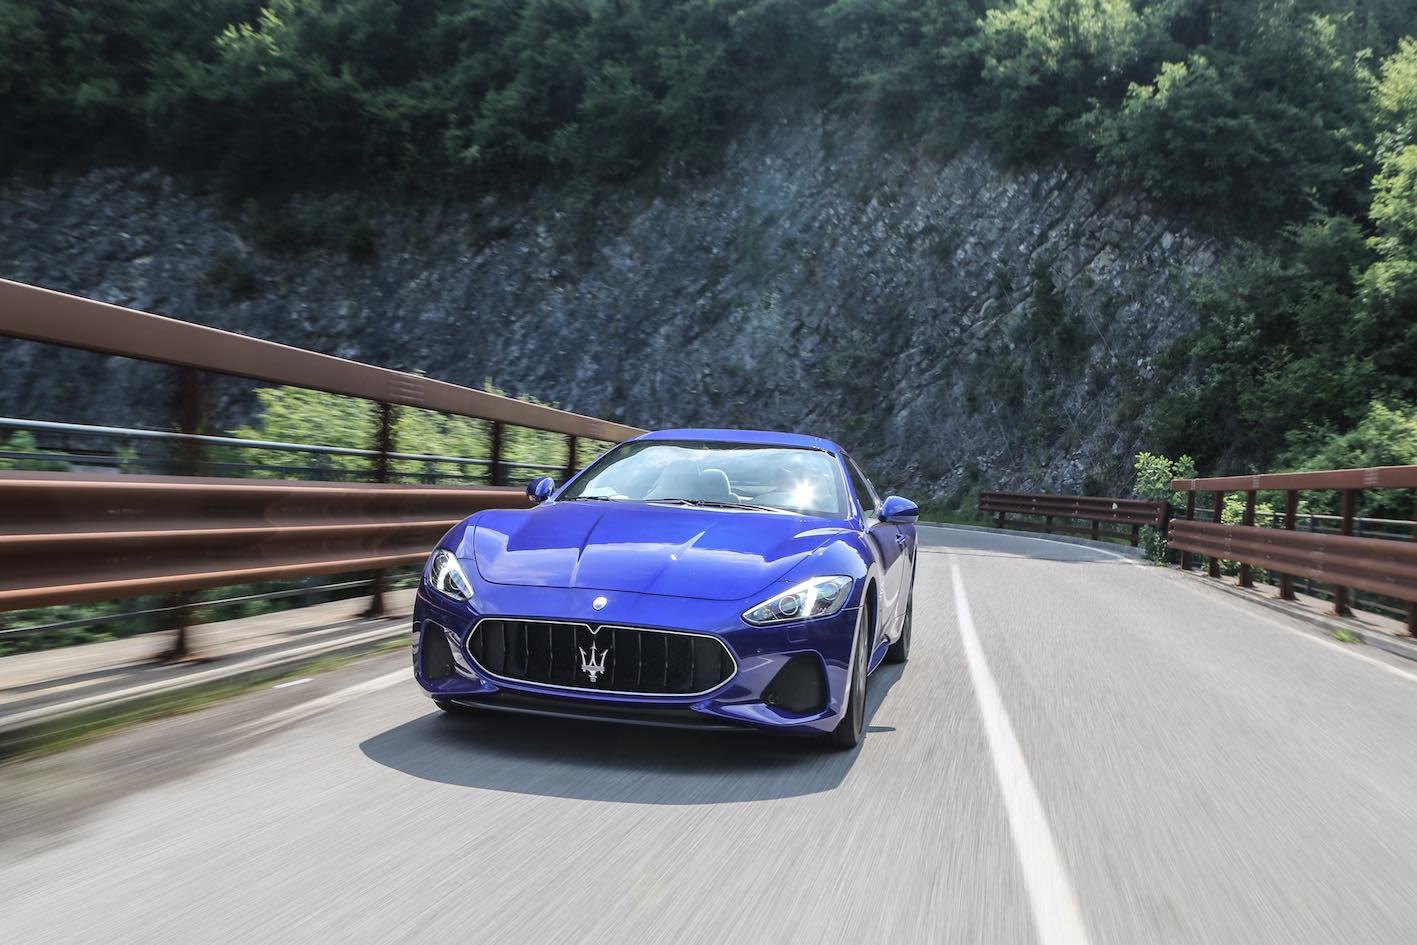 Maserati GranTurismo 2018 blau fahrt